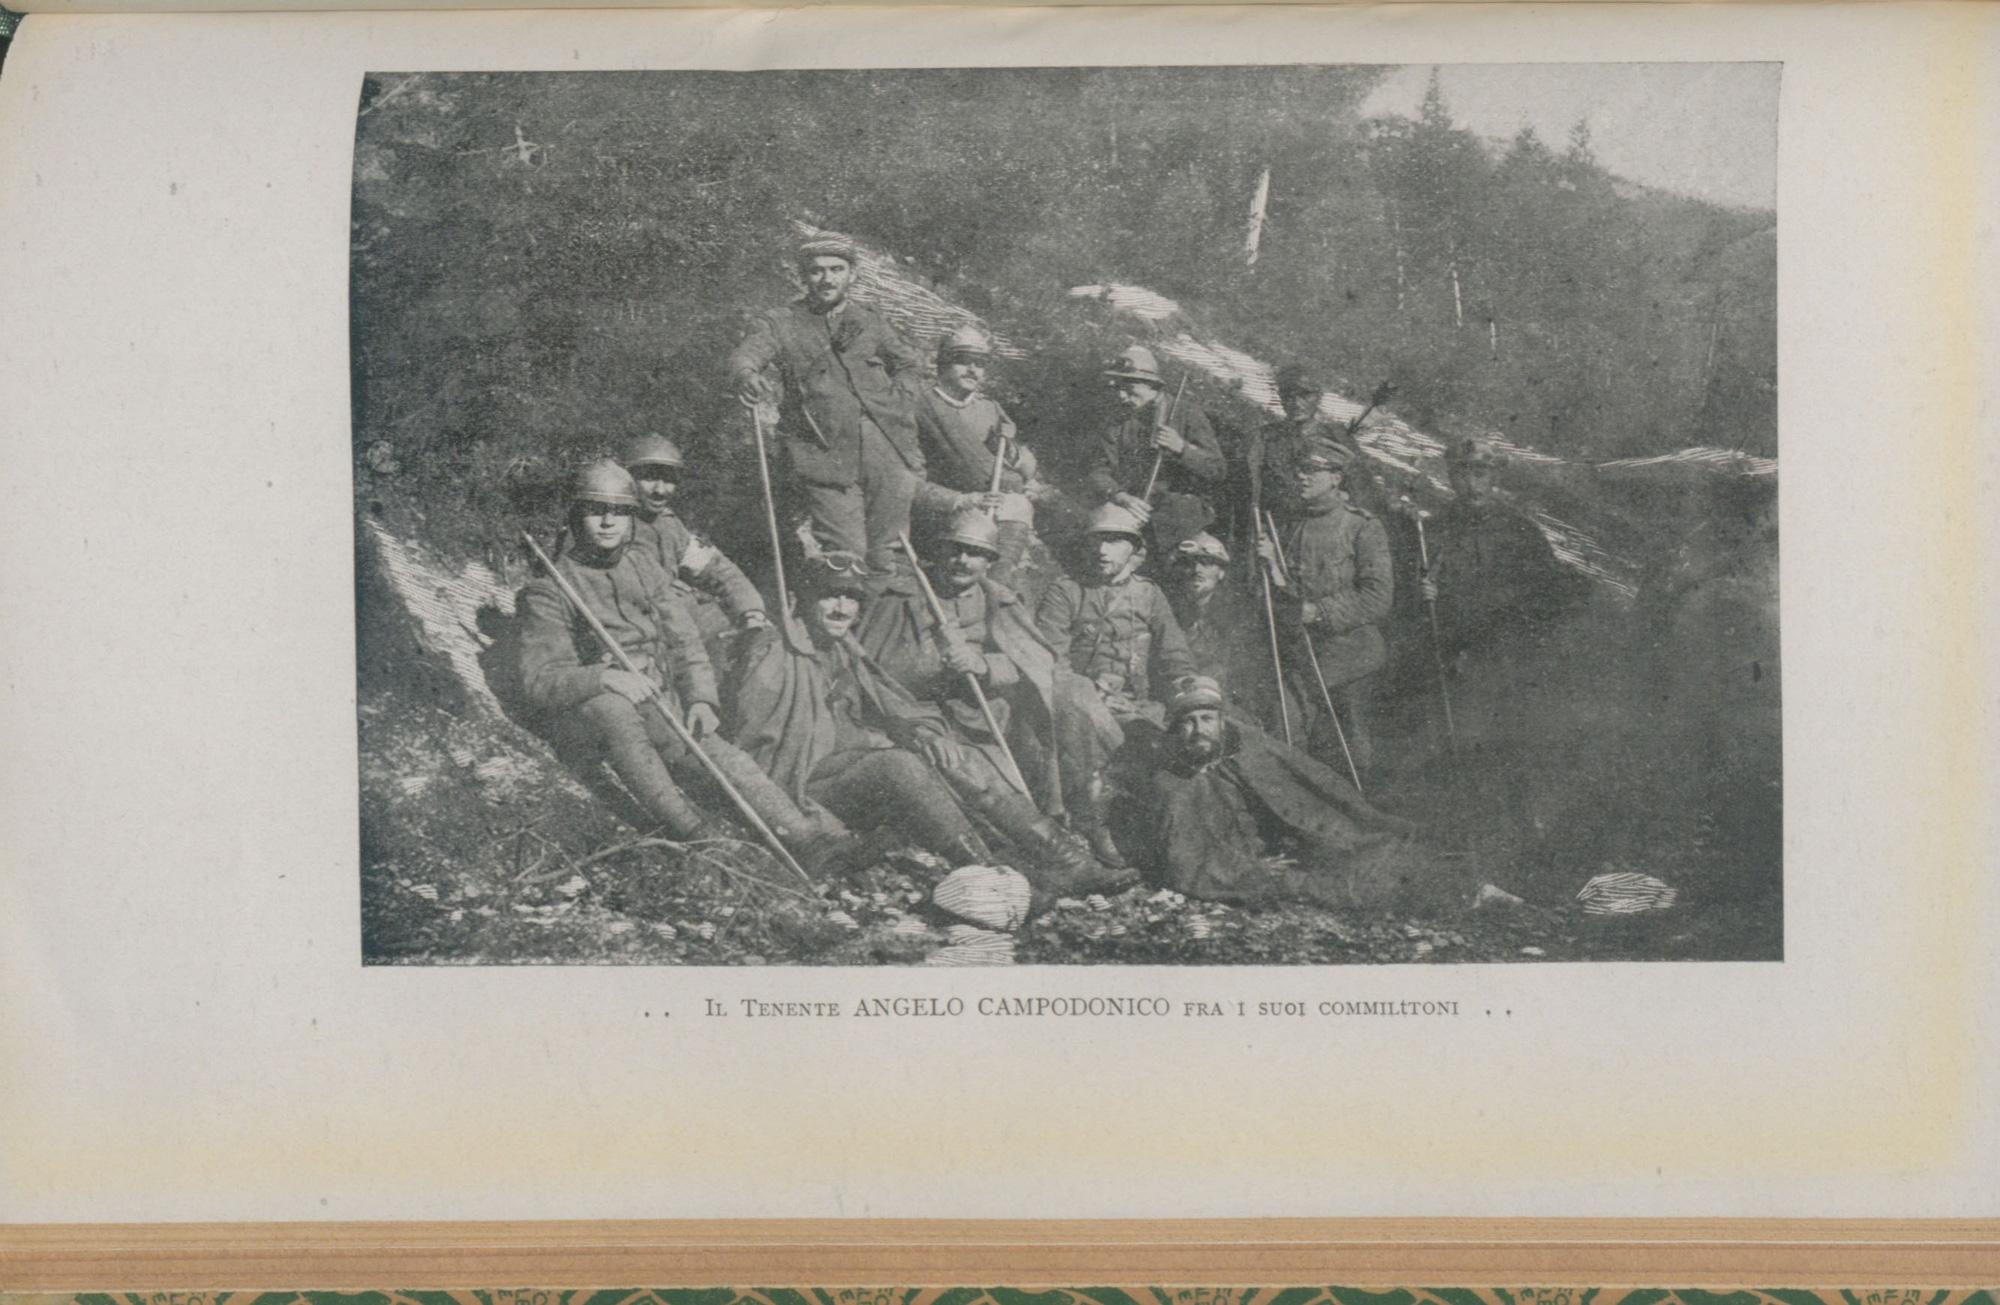 Lieutenant Angelo Campodonico among his comrades